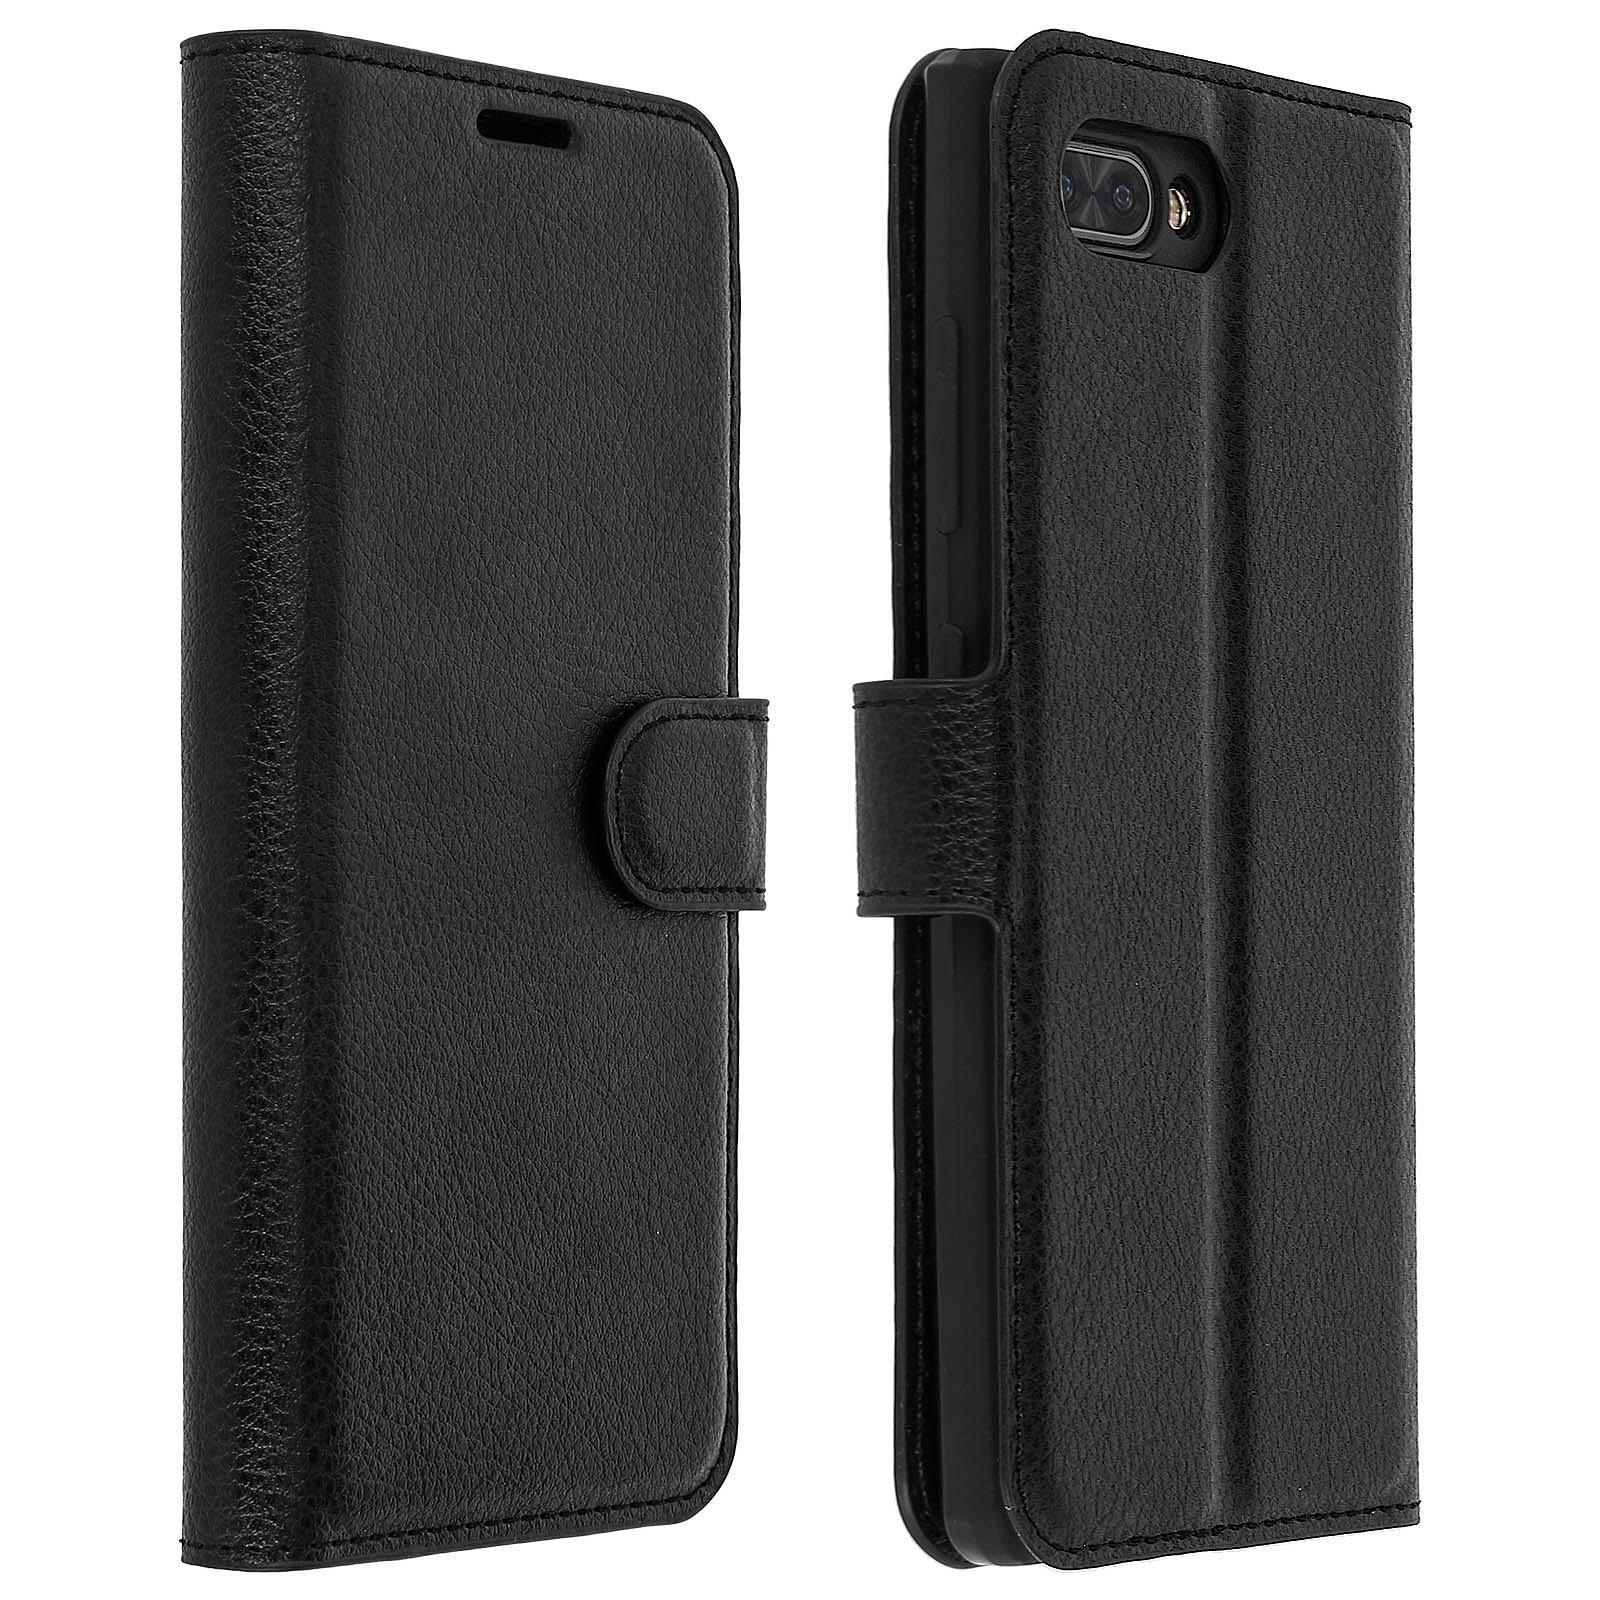 Avizar Etui folio Noir pour BlackBerry KEY2